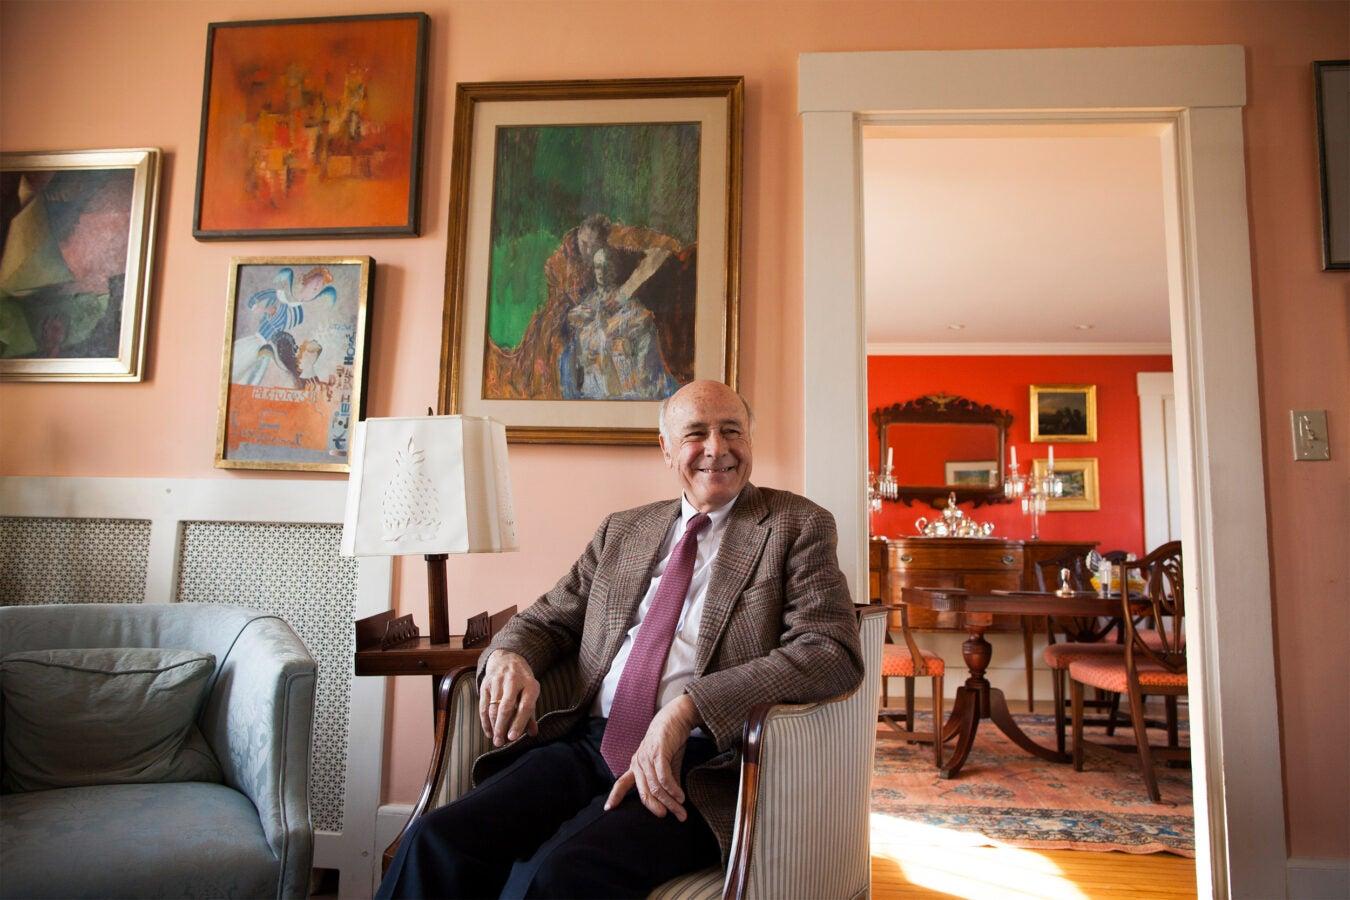 Joseph Nye in his living room.